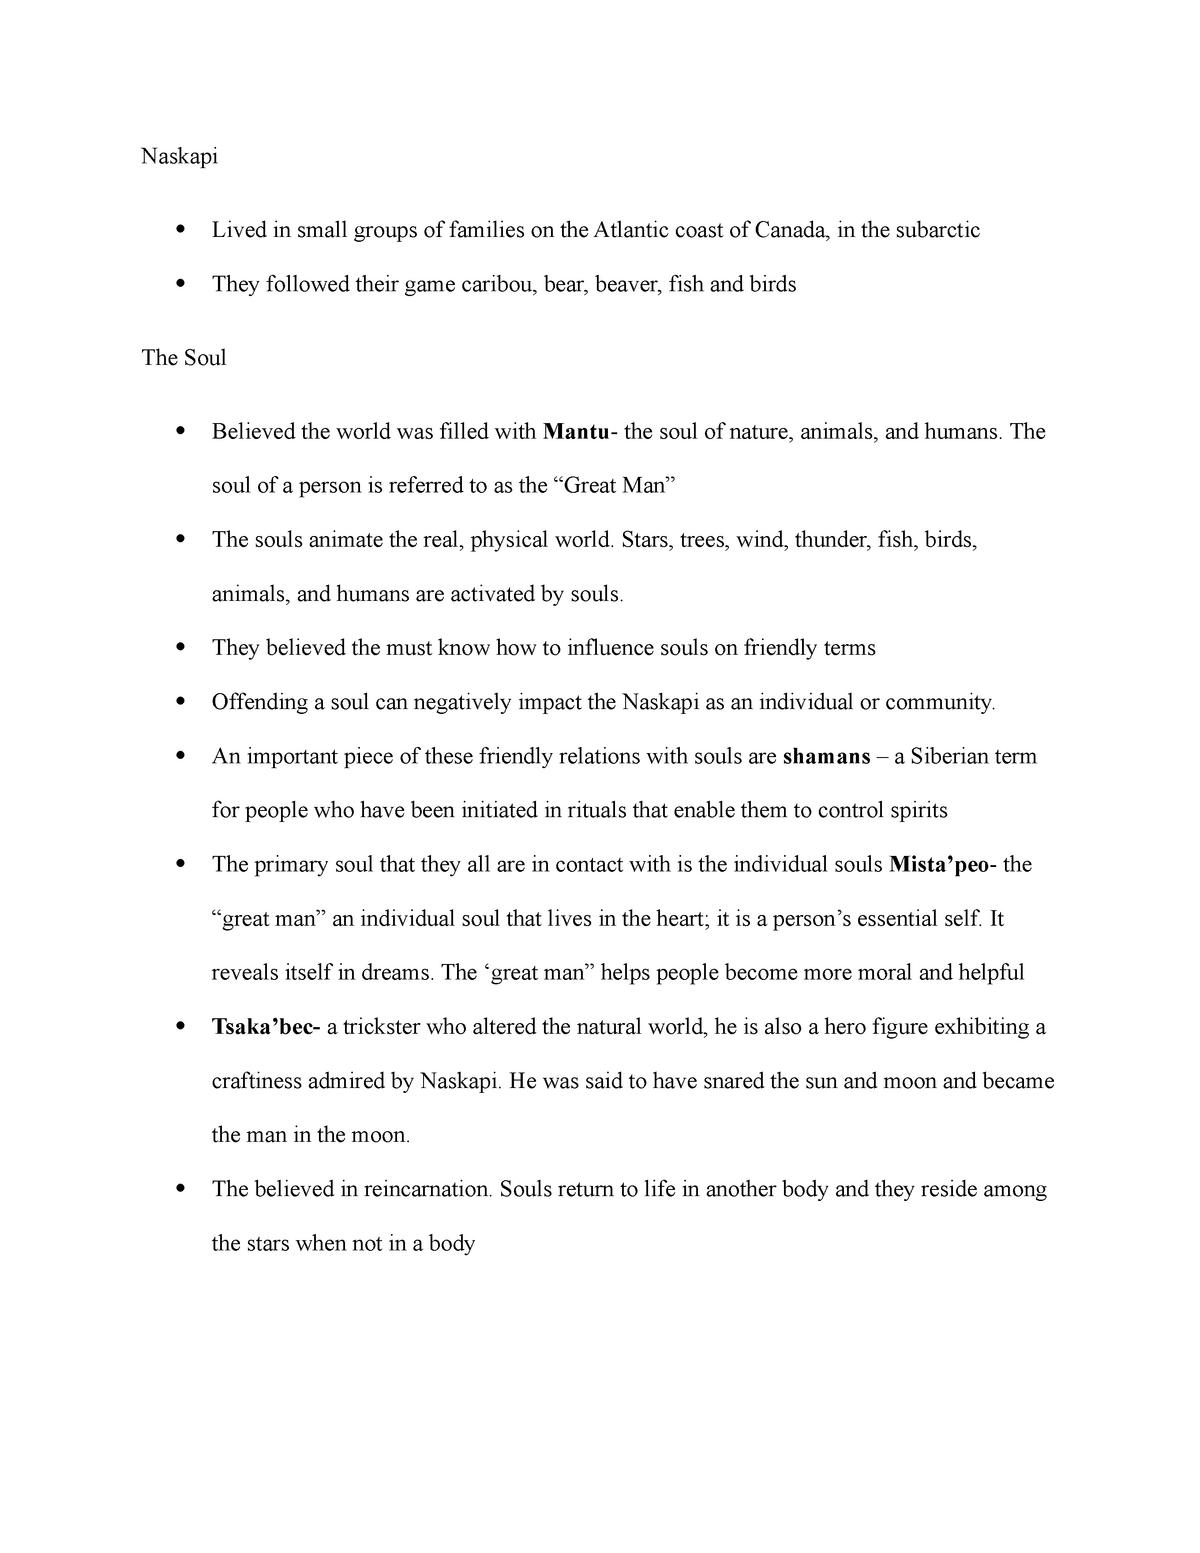 Naskapi - Lecture notes 4 - REL 1220 World Religions - StuDocu